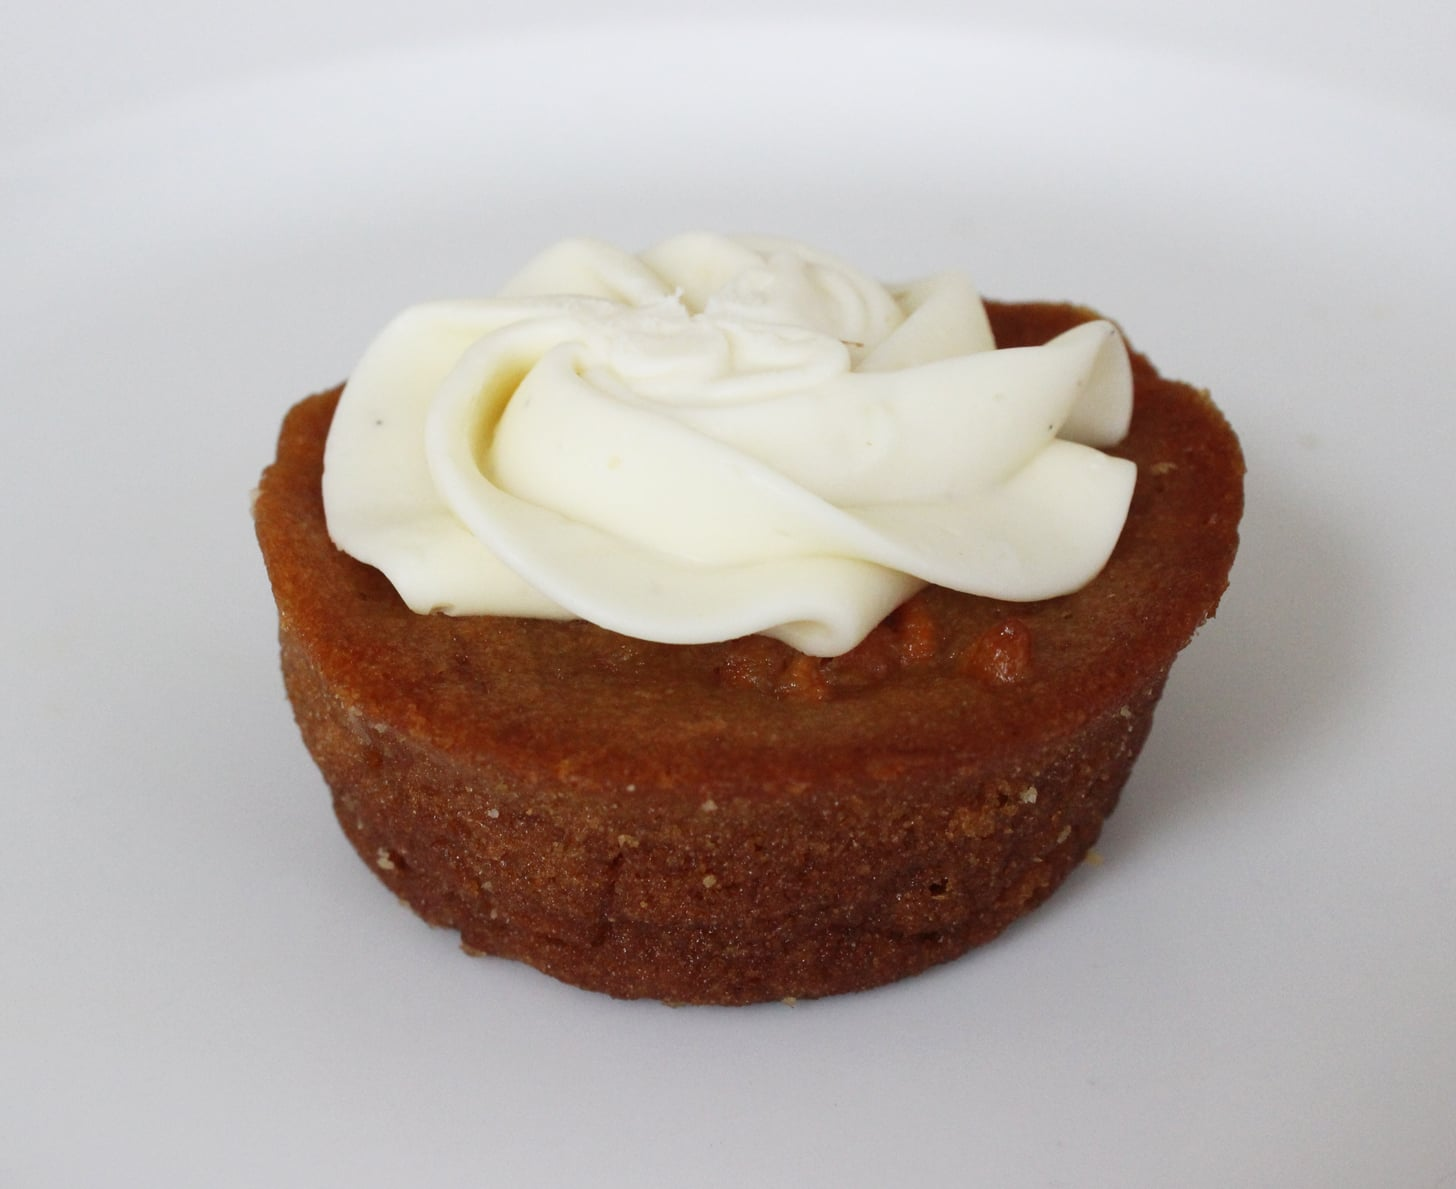 Day Three Dessert: Hold the Icing